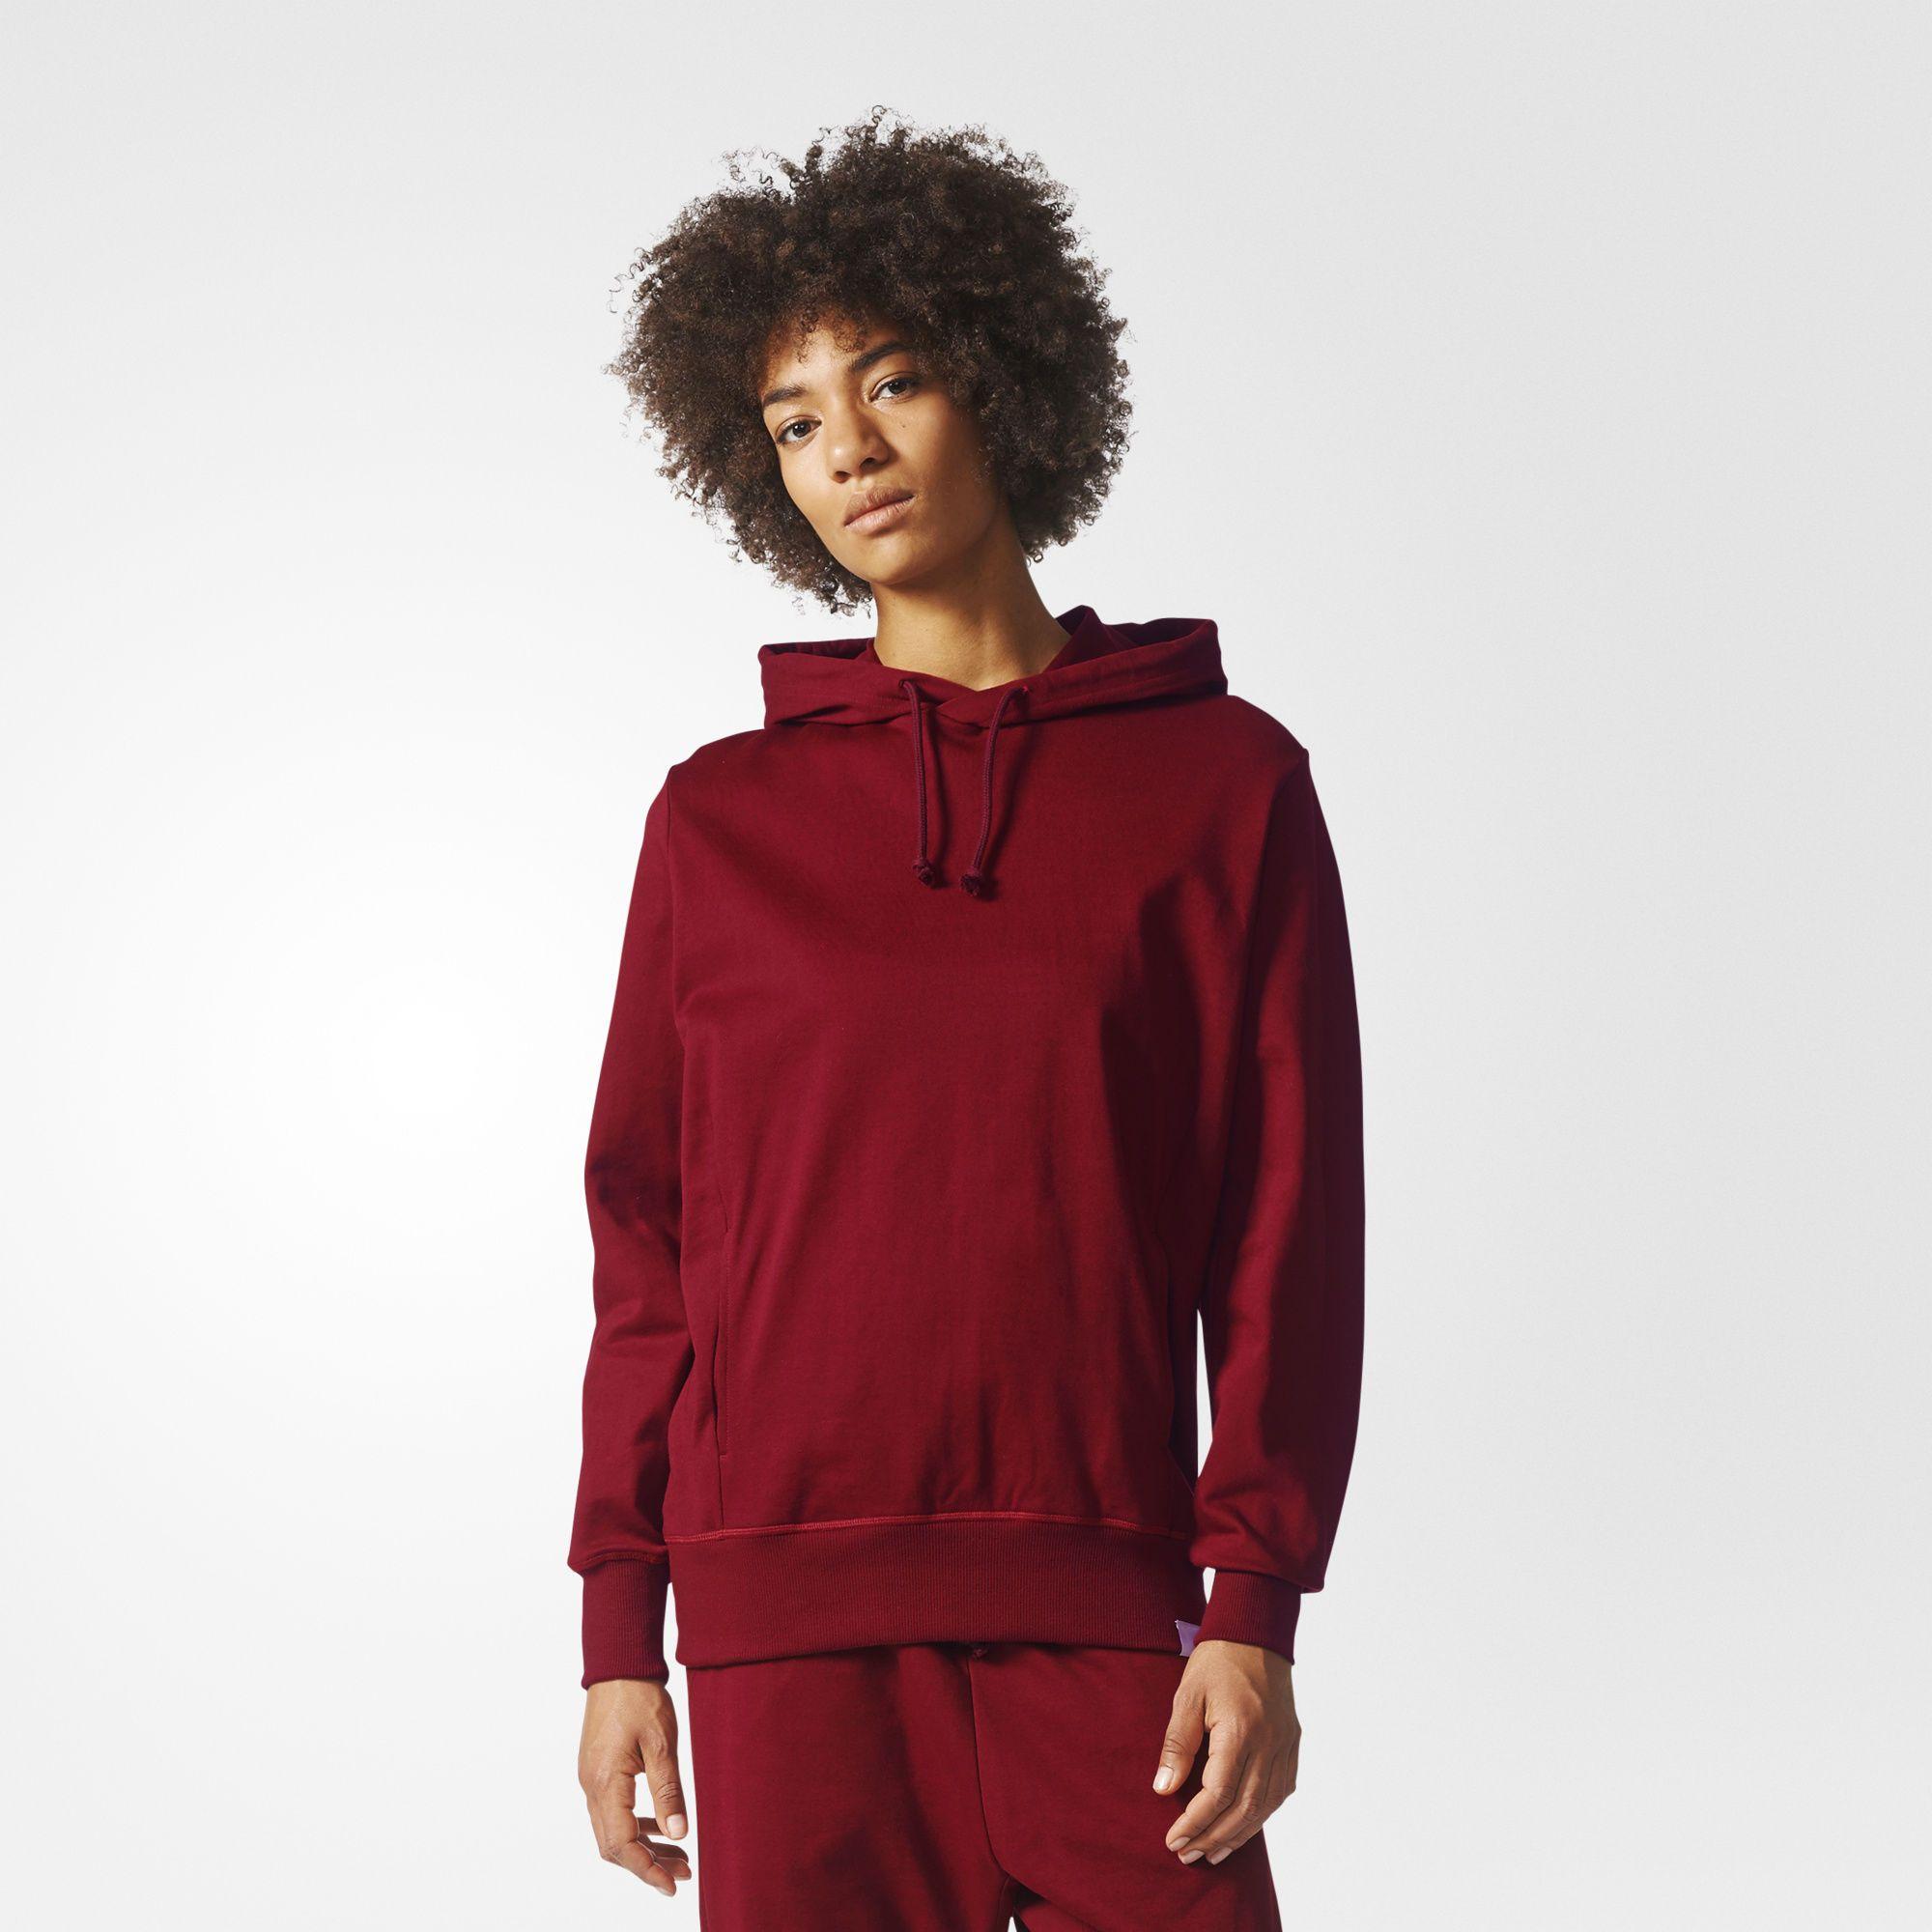 adidas XBYO Hoodie - Womens Hoodies & Sweatshirts